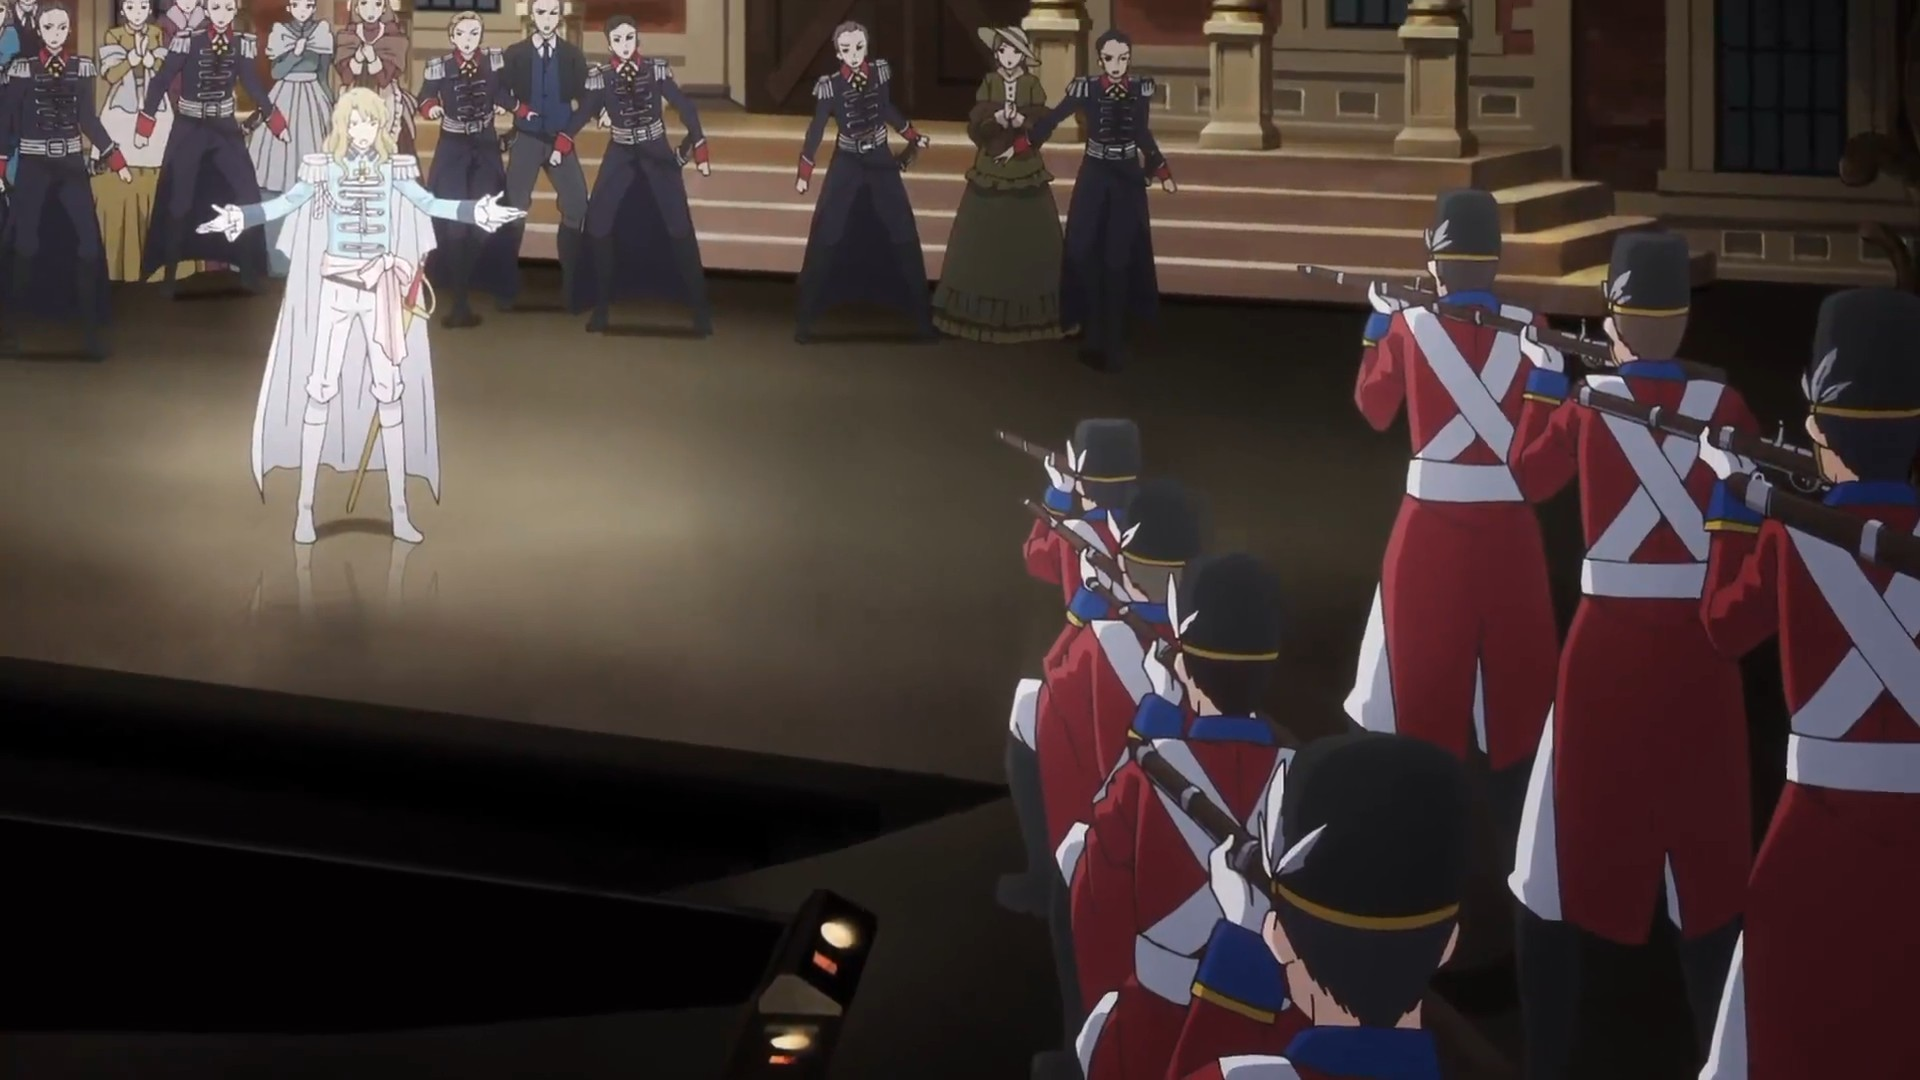 TV动画《歌剧少女!!》先导PV公开,2021年播出- ACG17.COM